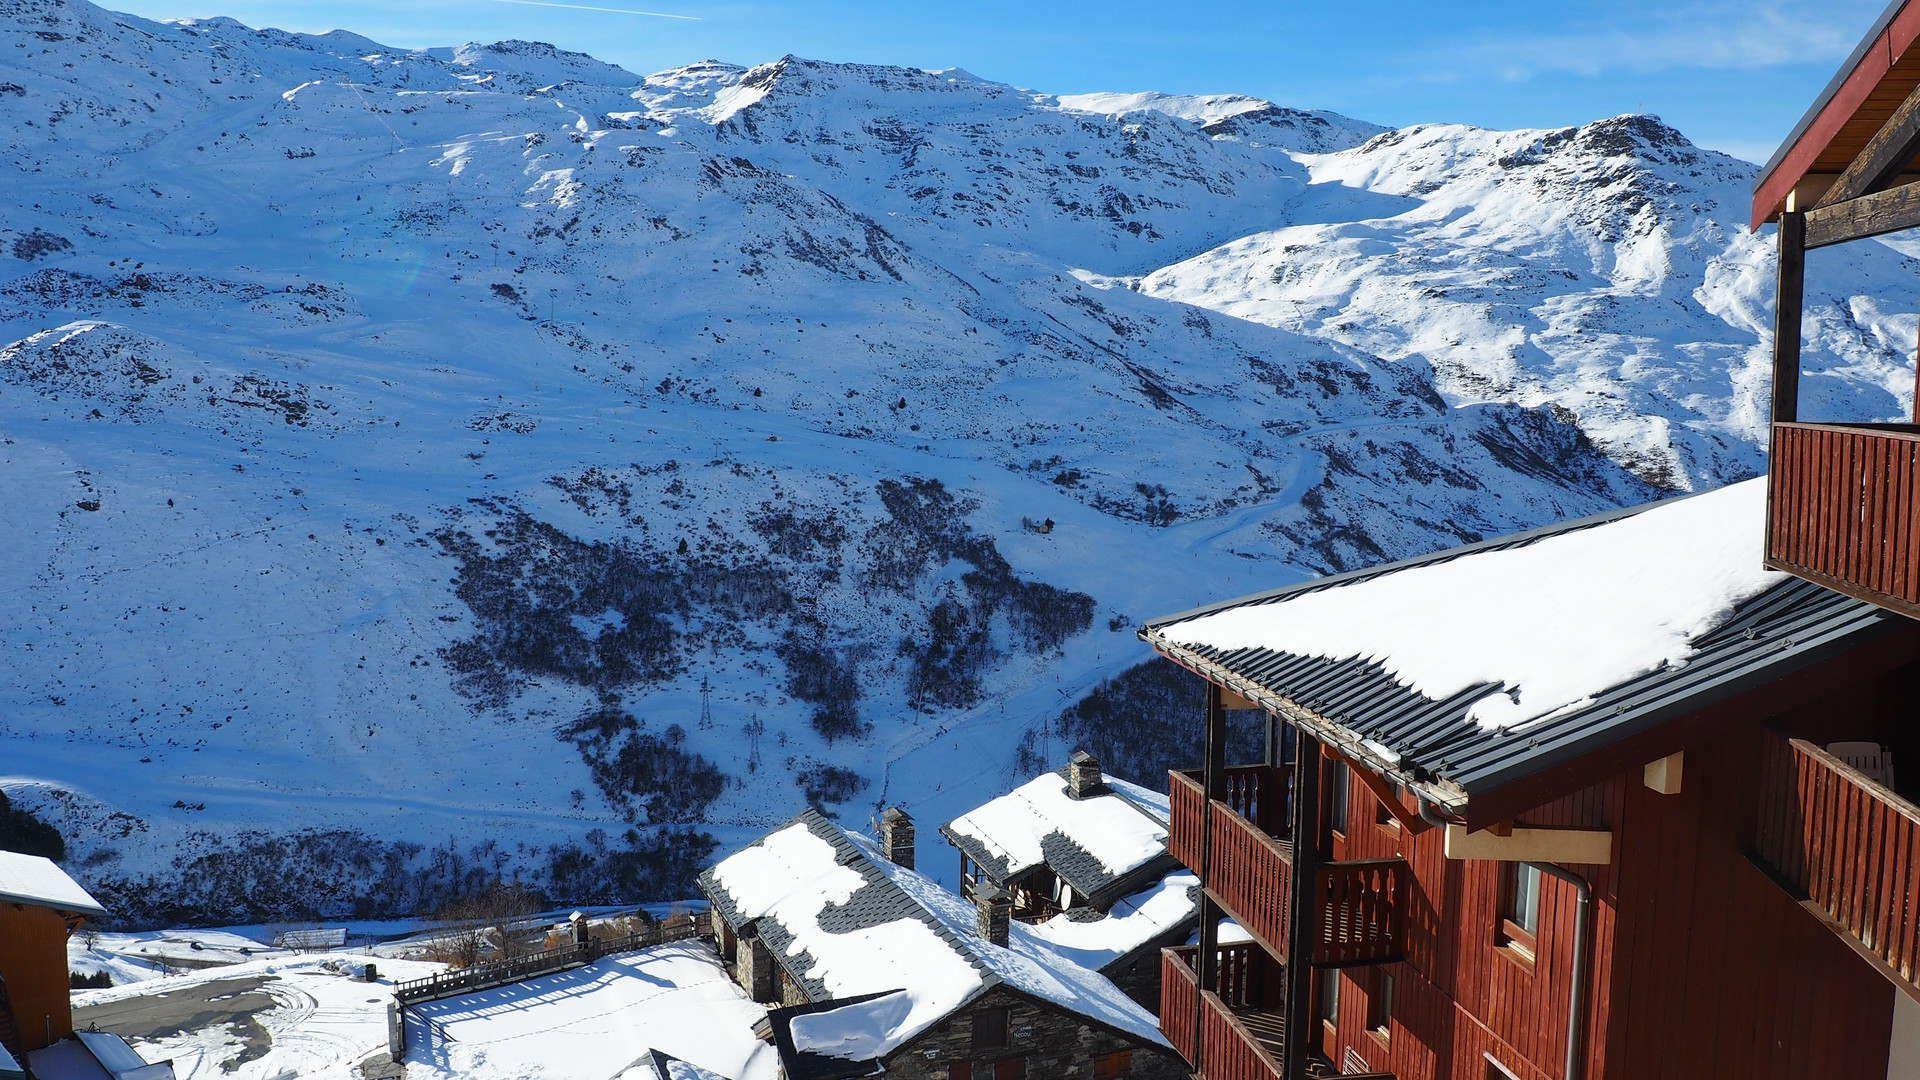 5 Pers Studio ski-in ski-out / NECOU 714